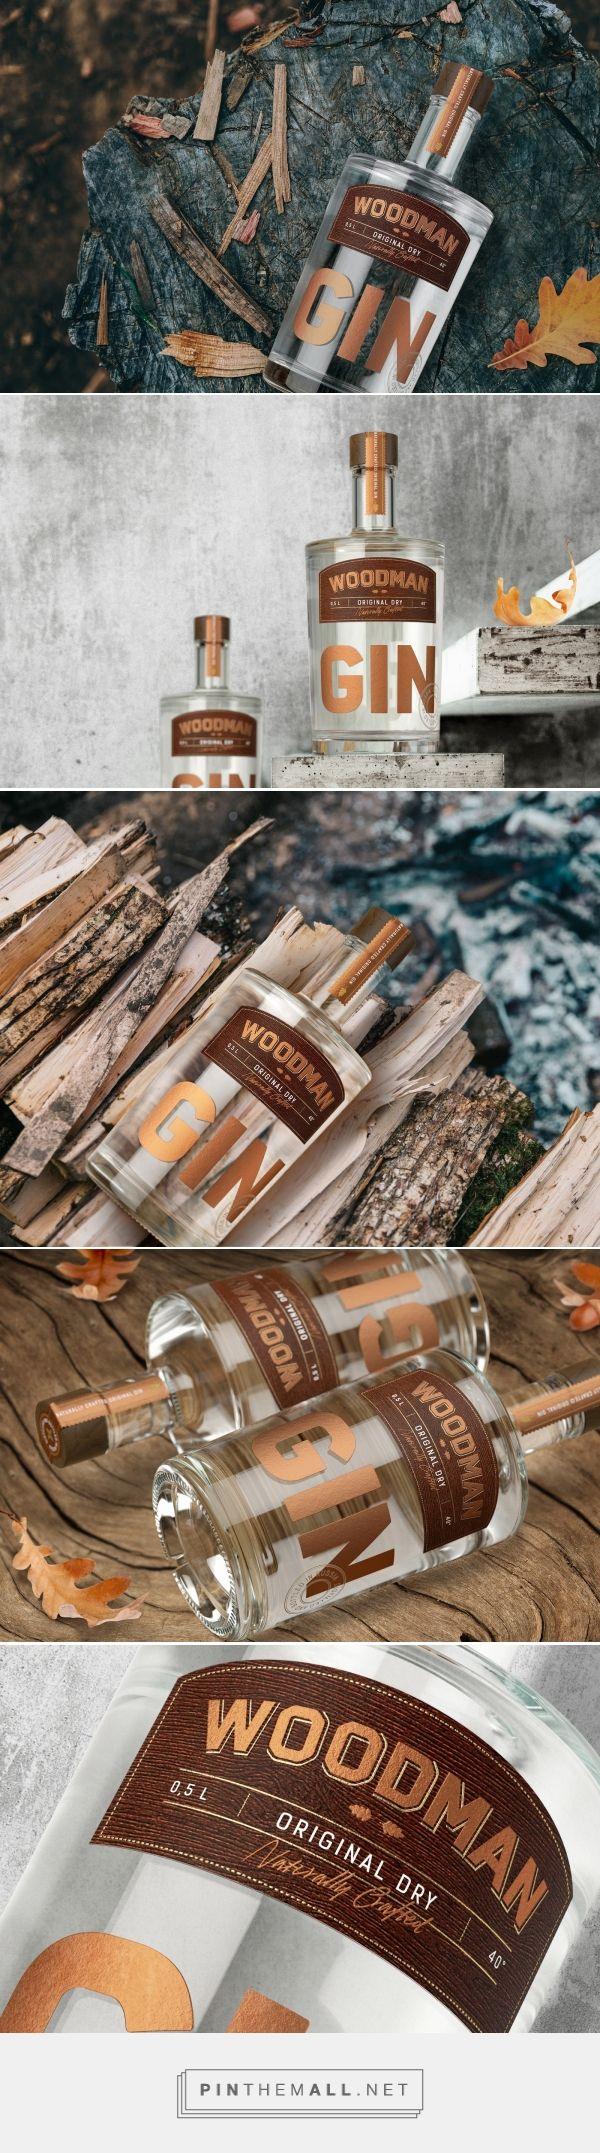 Woodman - Packaging of the World - Creative Package Design Gallery - http://www.packagingoftheworld.com/2017/11/woodman.html